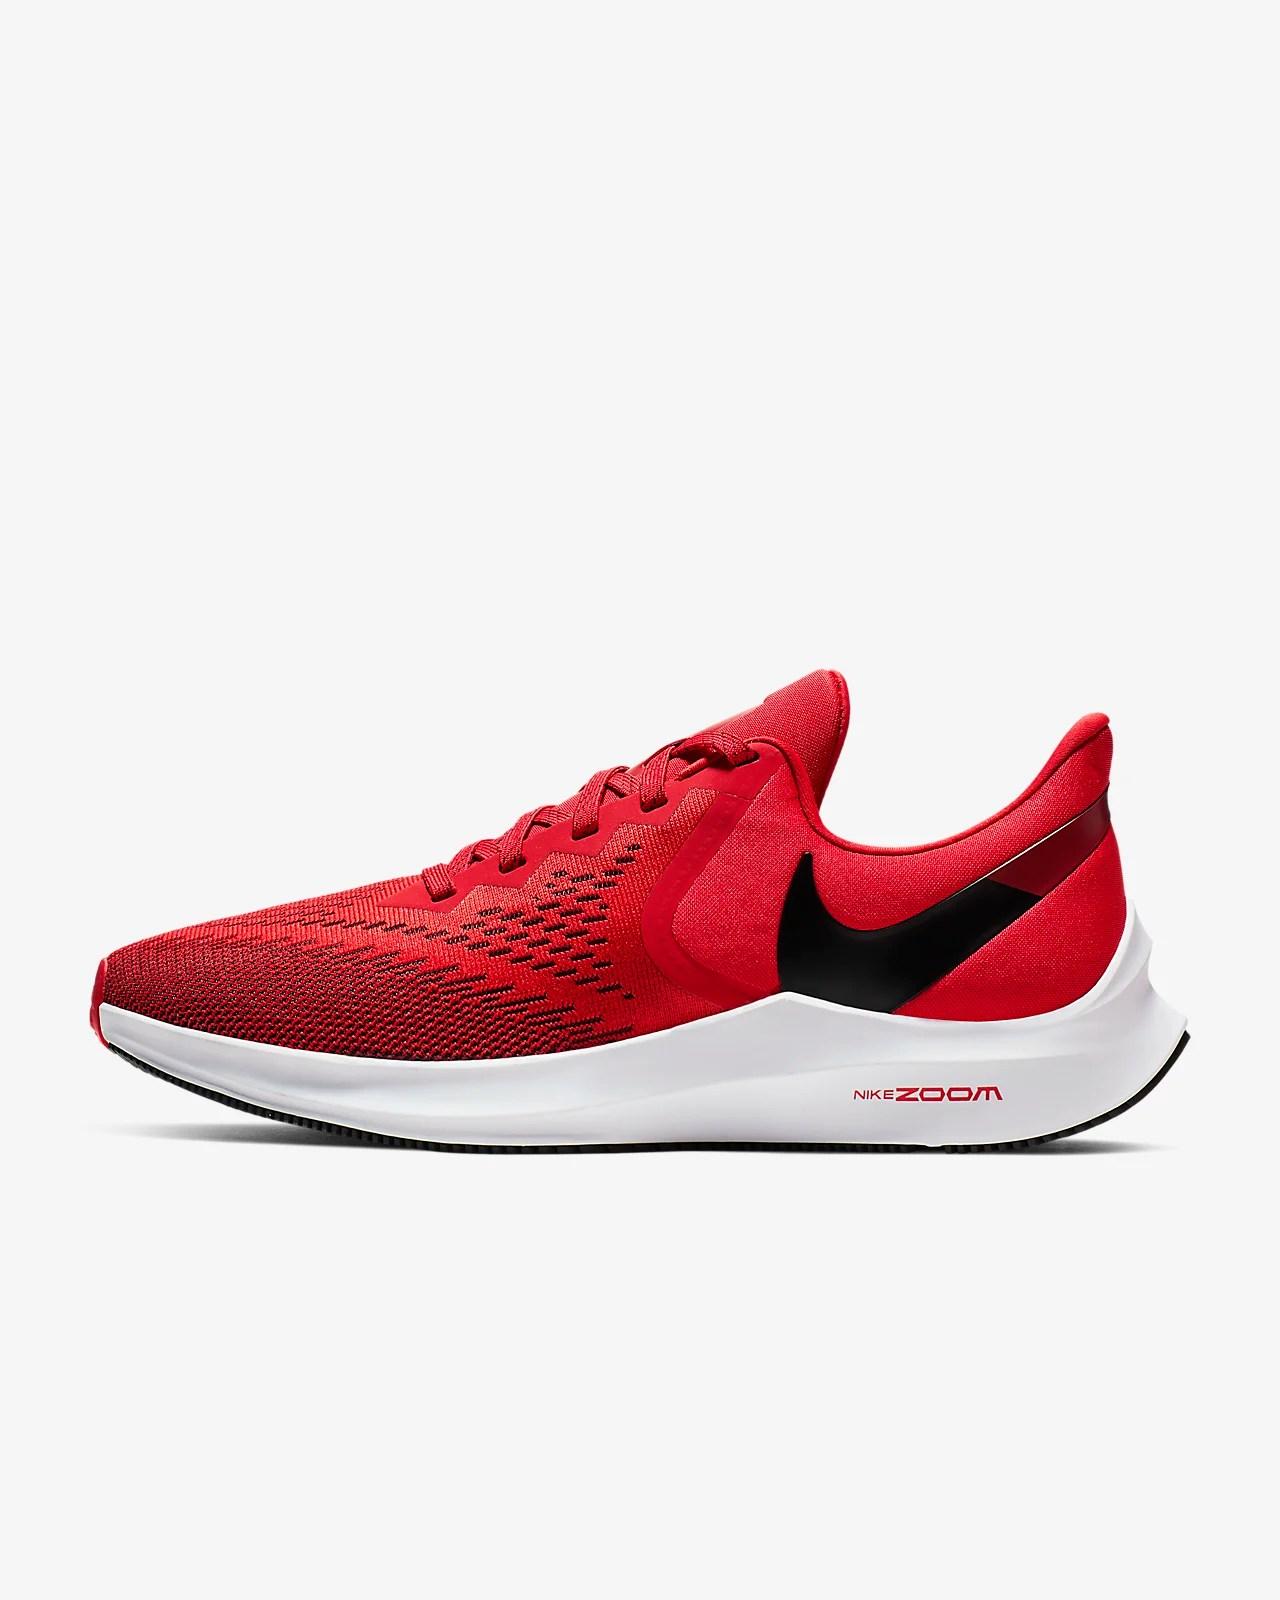 2b14e0b63f0d2 Nike Air Zoom Winflo 6 Men S Running Shoe